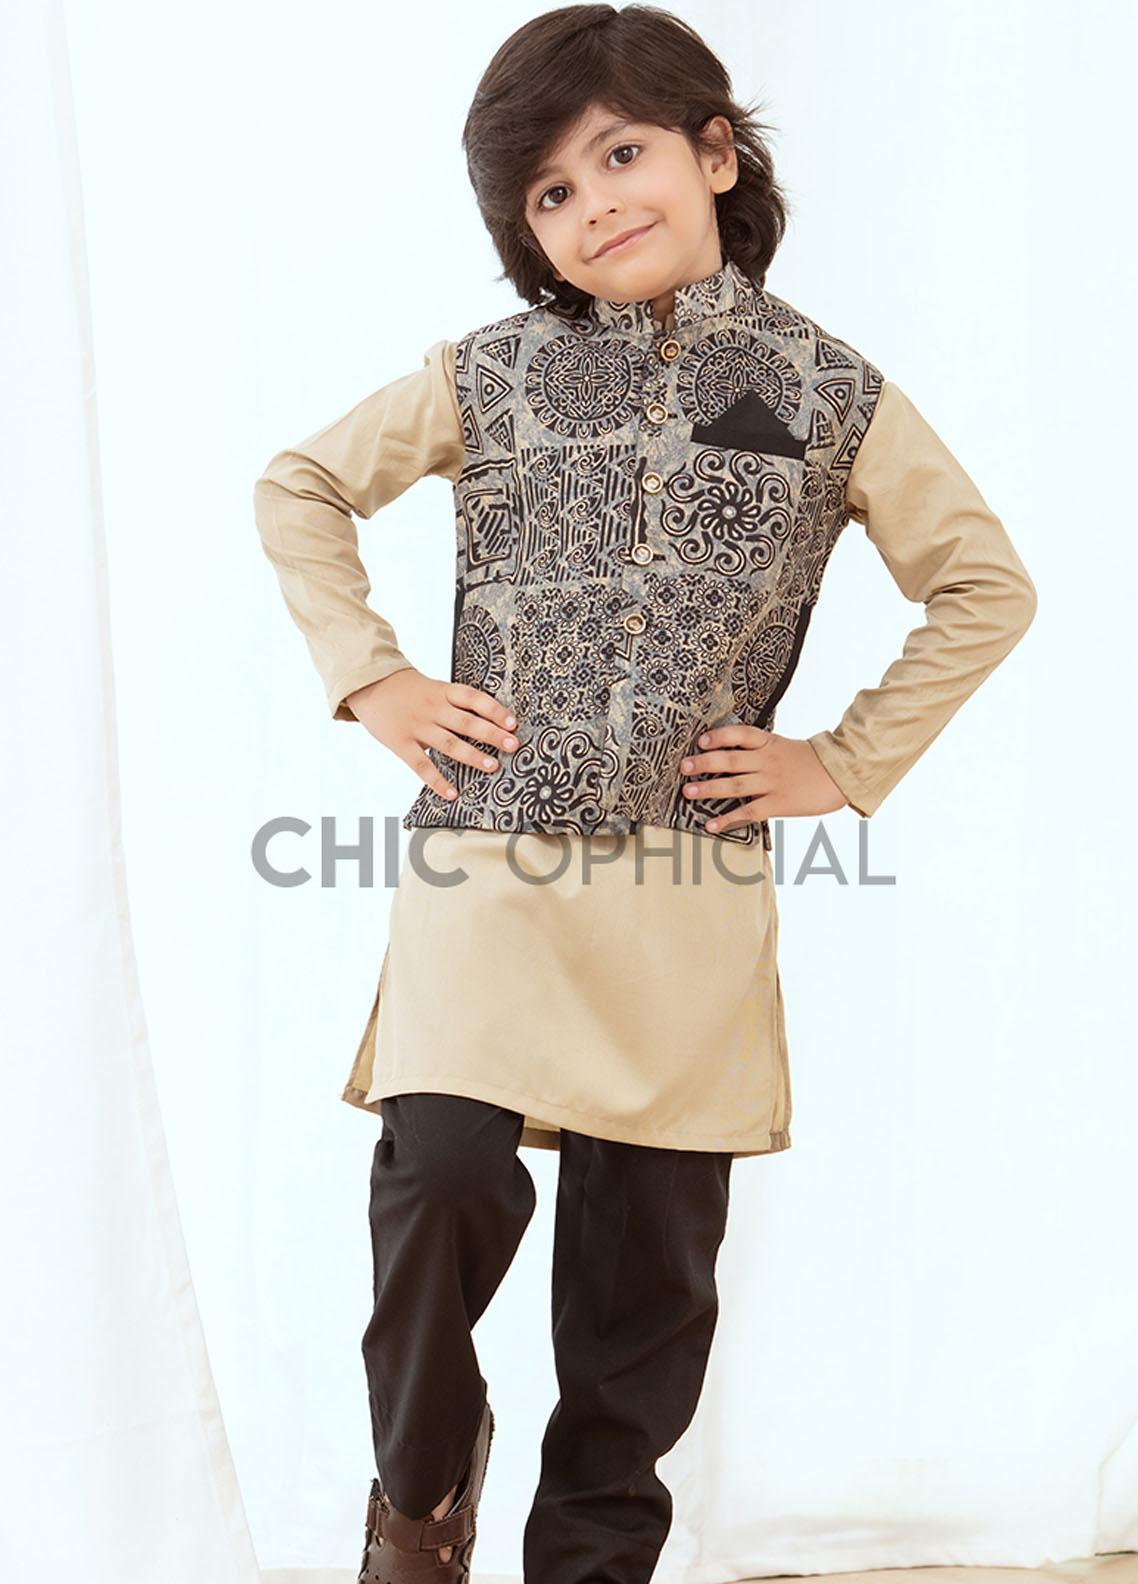 Chic Ophicial Wash N Wear Fancy 3 Piece for Boys -  Batik effect